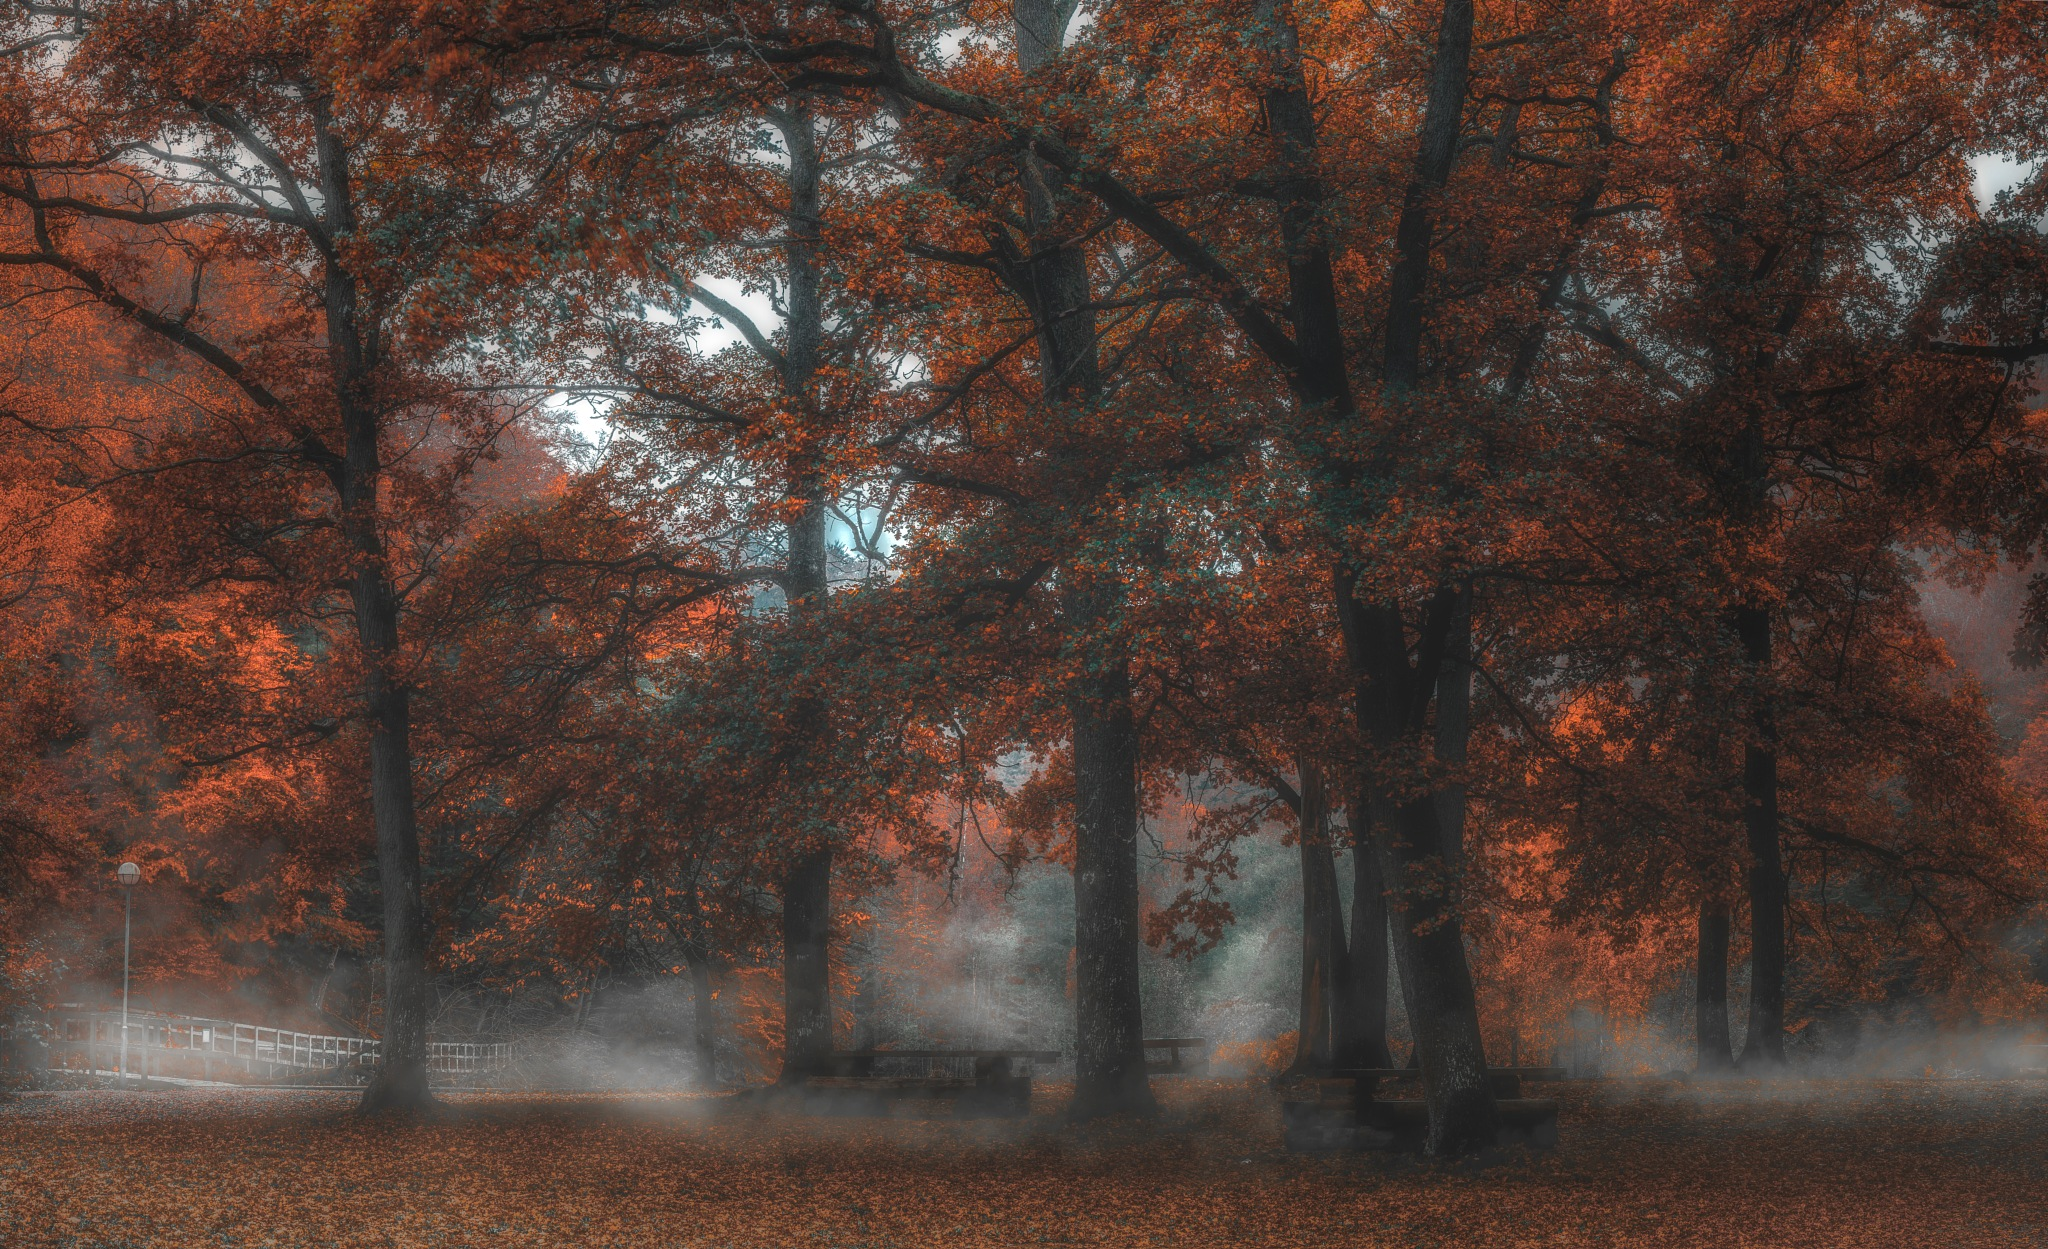 Autumn atmosphere by Göran Ebenhart